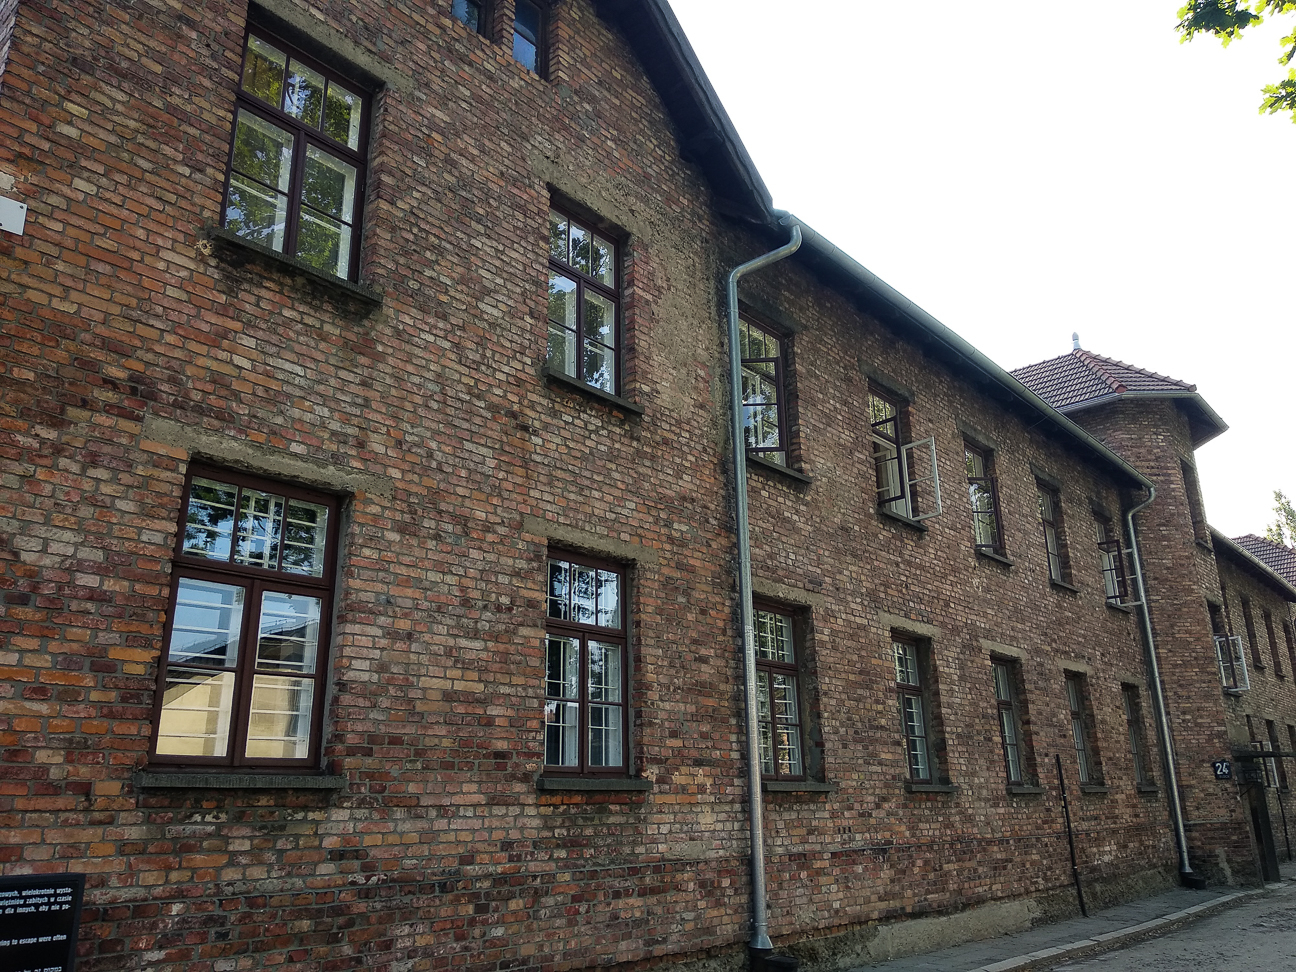 Edificios de Auschwitz campo concentracion nazi